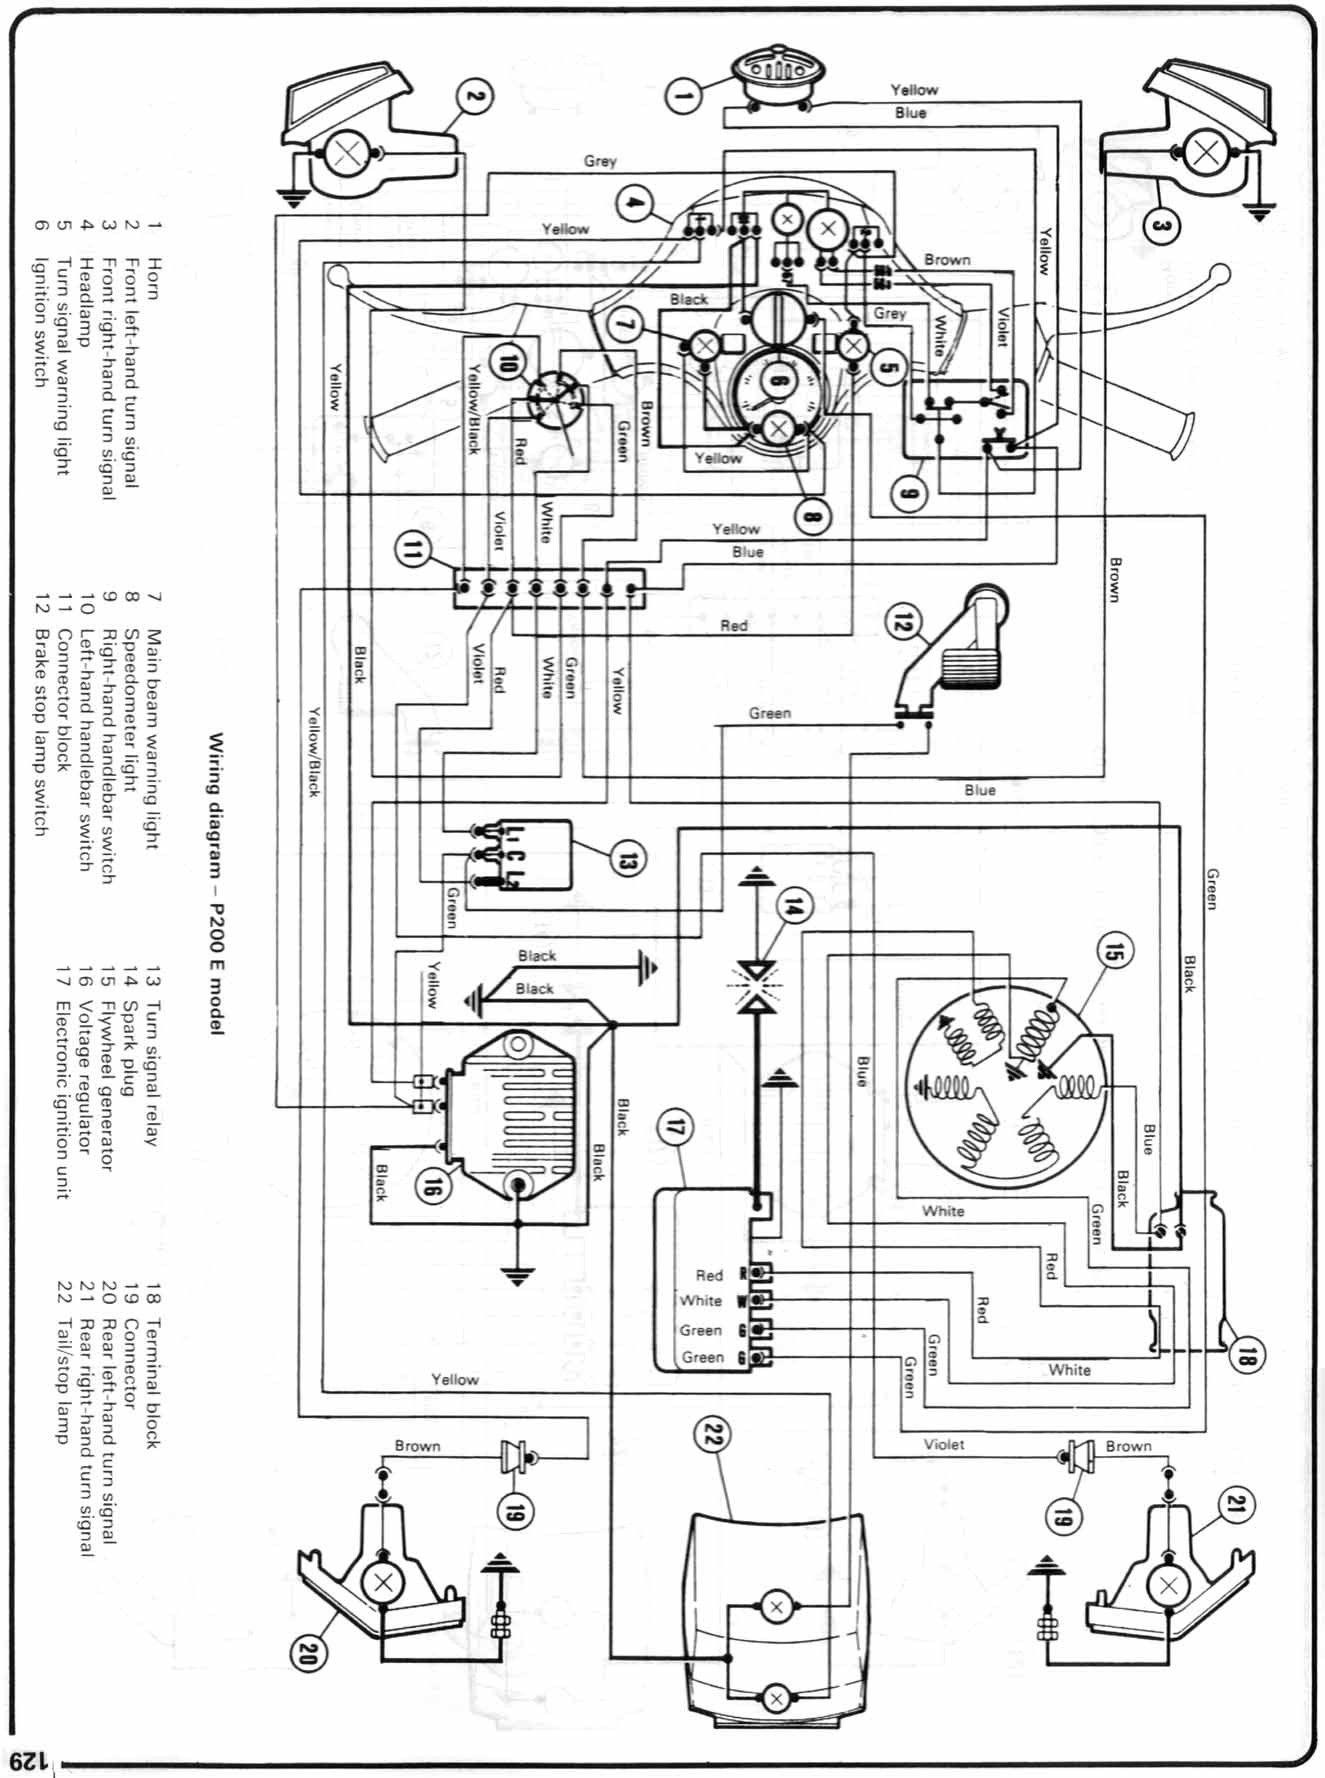 Acdelco Alternator Wiring Diagram Free Download